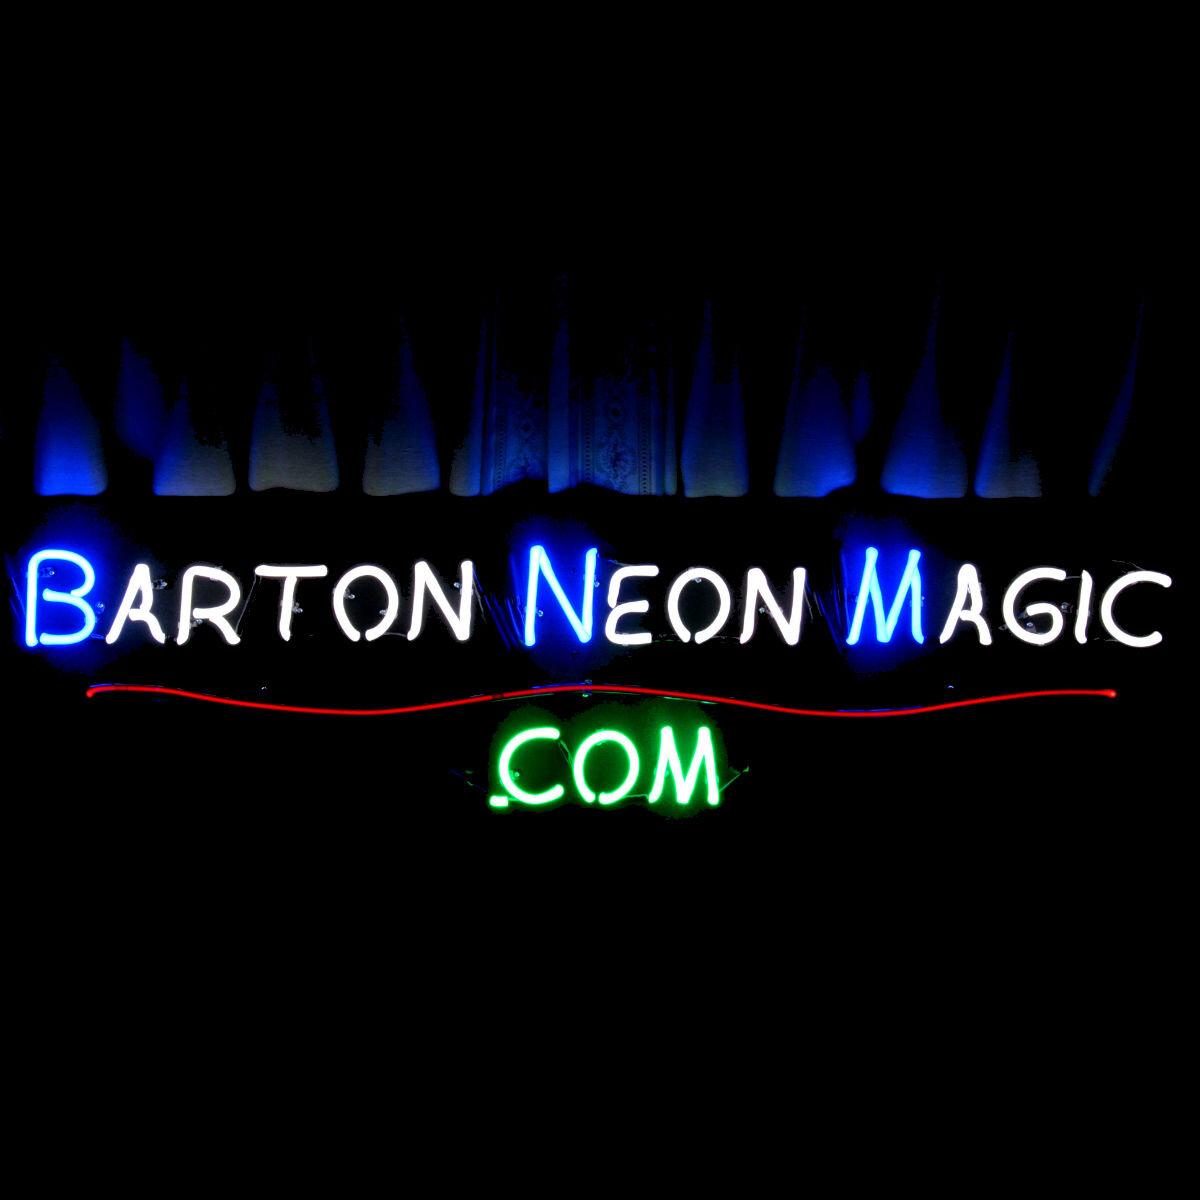 Designer CAT NEON LIGHT ARTWORK by John Barton - BartonNeonMagic.com